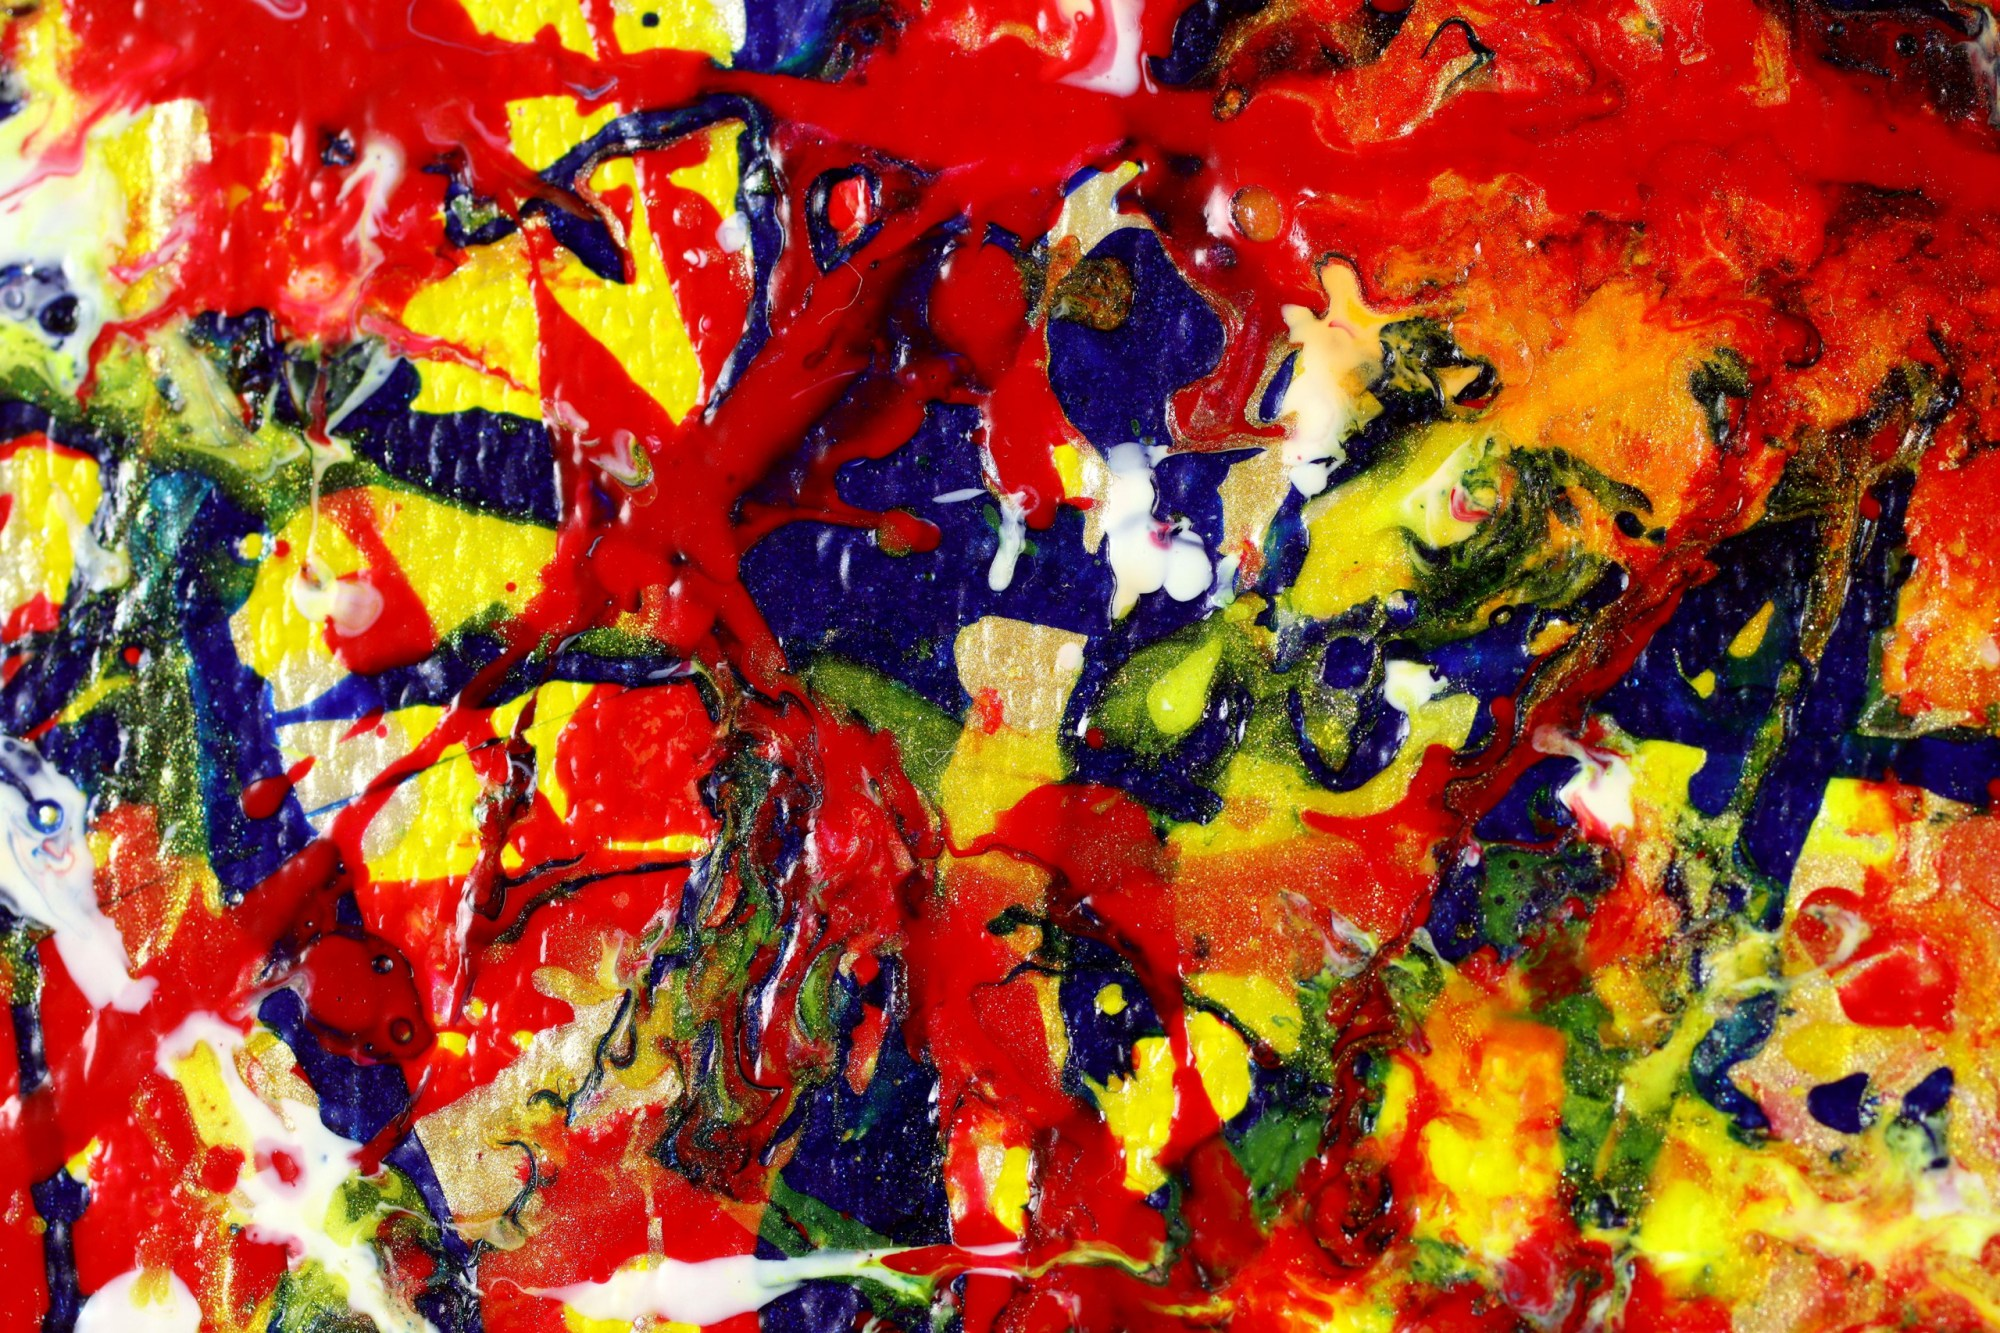 DETAIL / Colorful Display of Affection 3 (2021) / ARTIST: NESTOR TORO